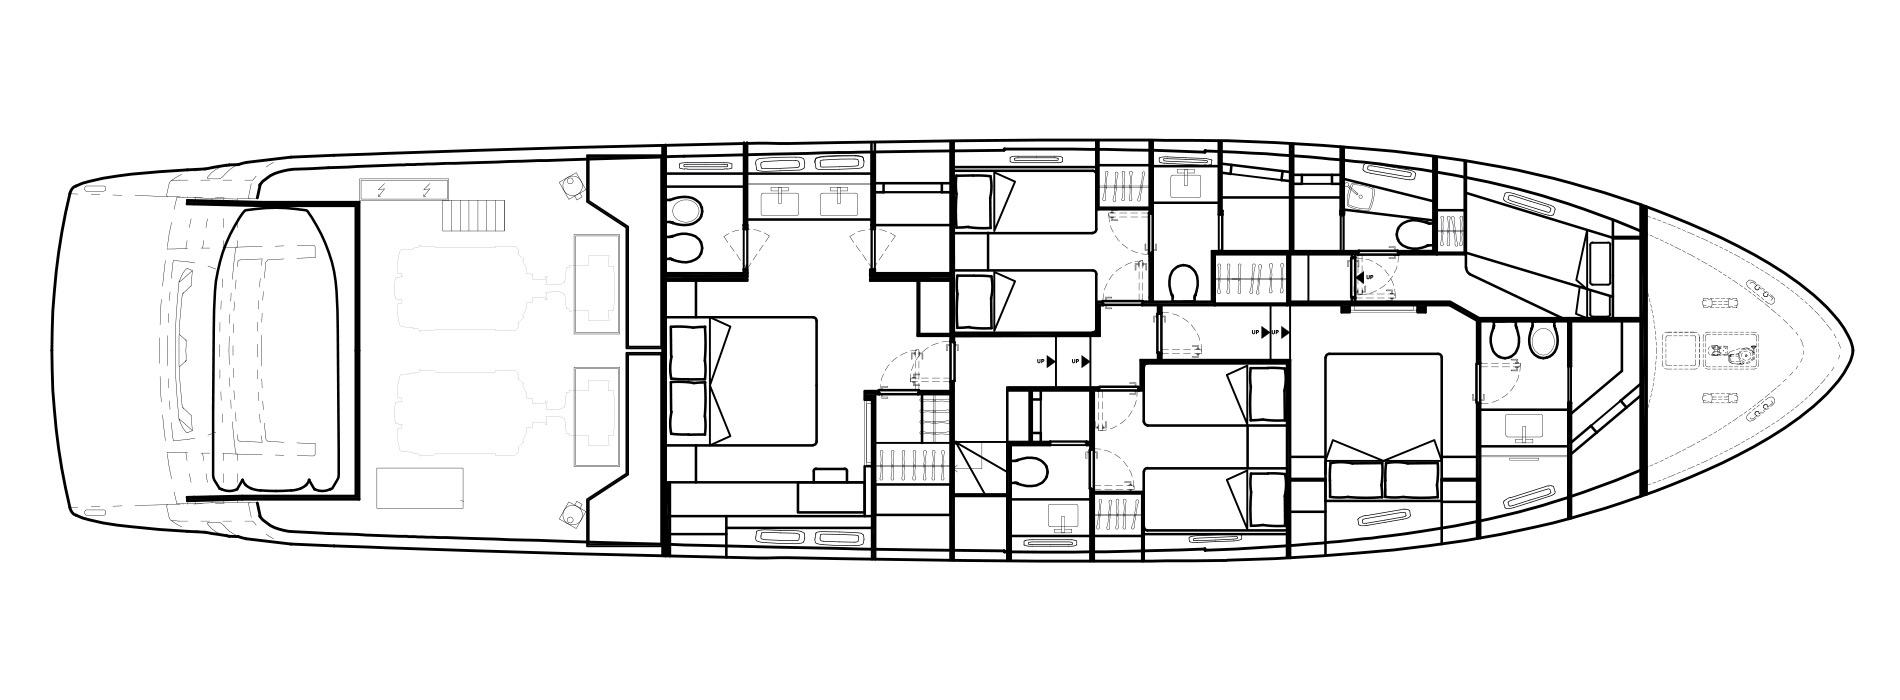 Sanlorenzo Yachts SL78 Lower Deck Version B